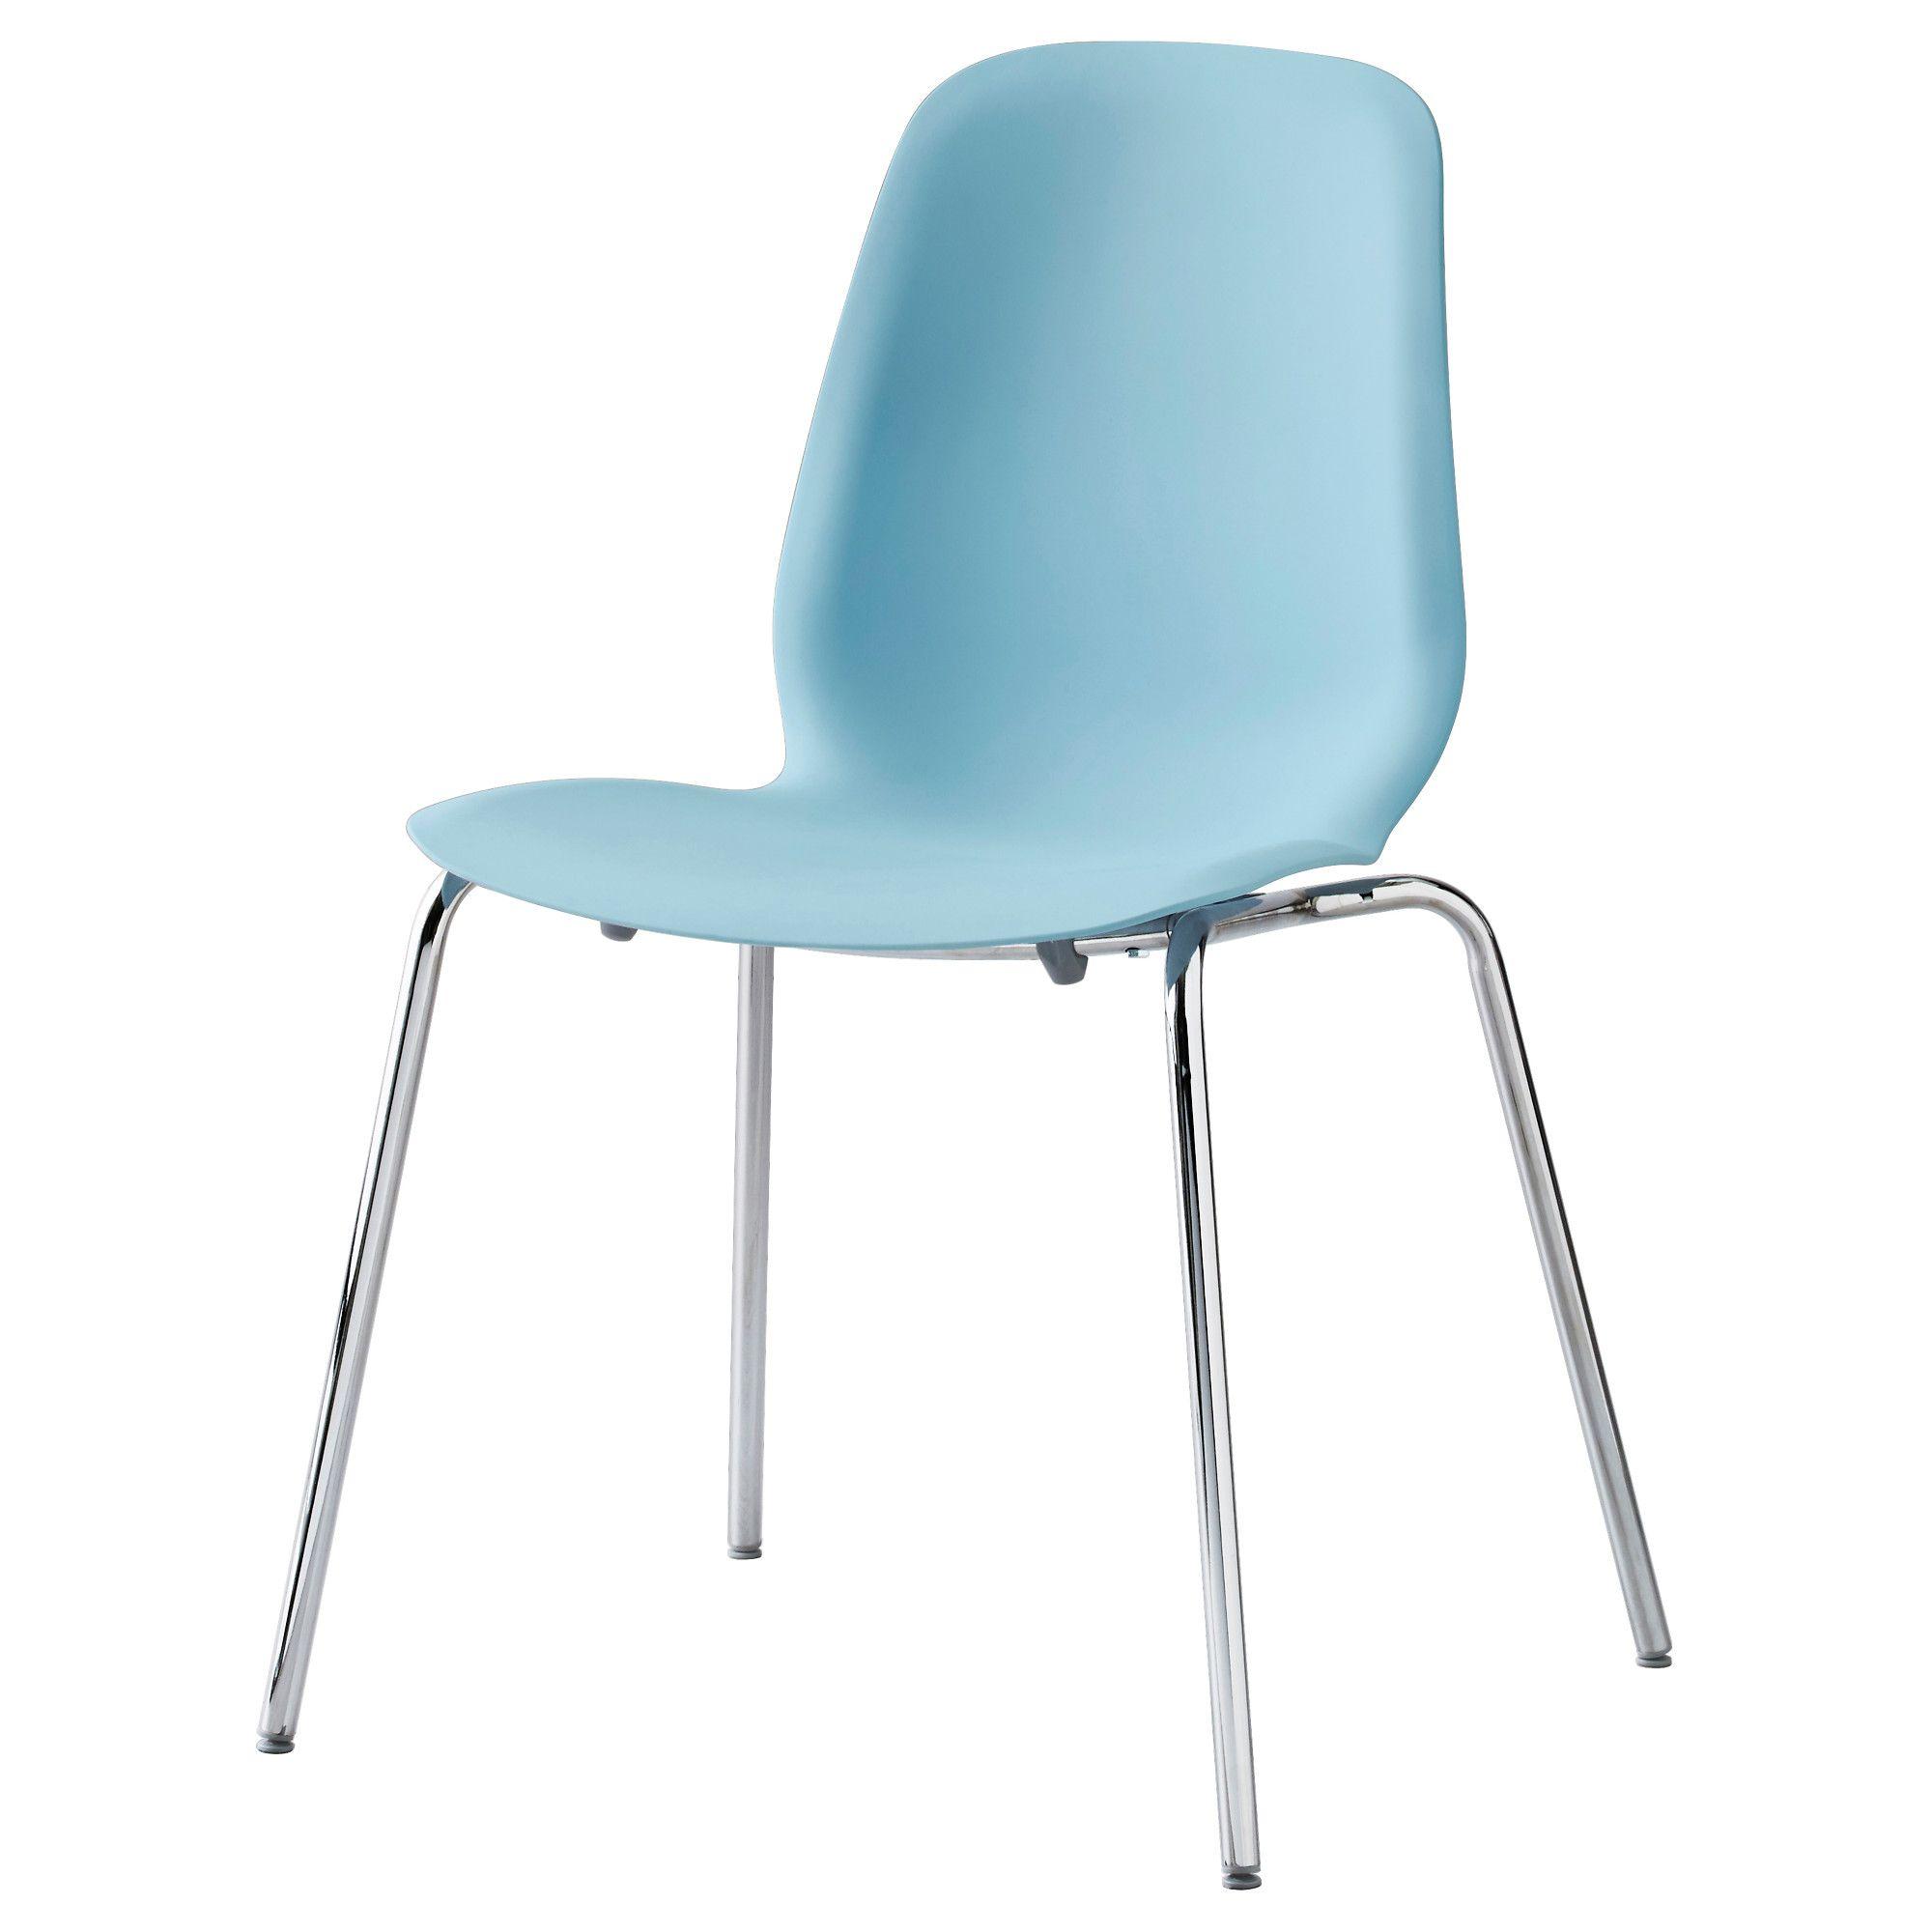 LEIFARNE Chair, light blue, Broringe chrome plated | Die küche, Ikea ...